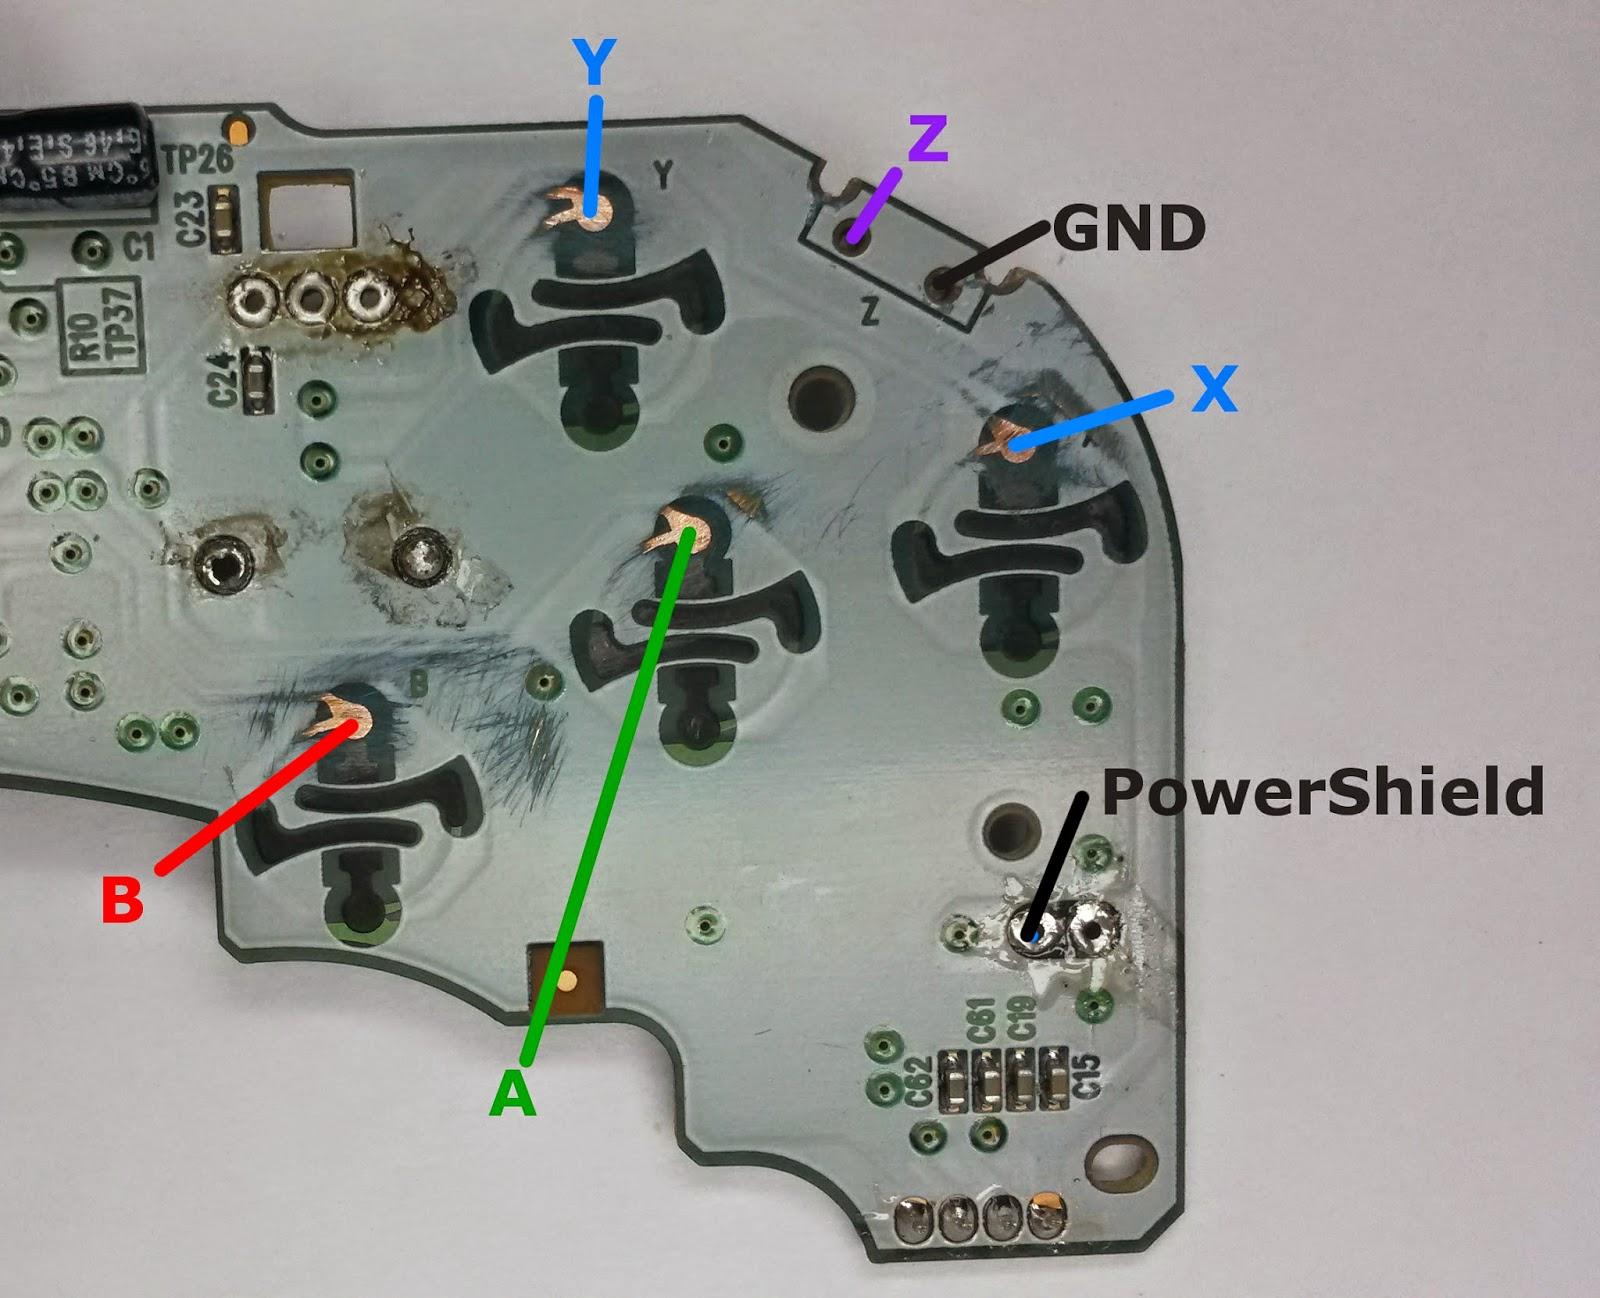 medium resolution of gamecube controller wiring diagram right stick simple wiring schema gamecube roms gamecube controller wiring diagram right stick